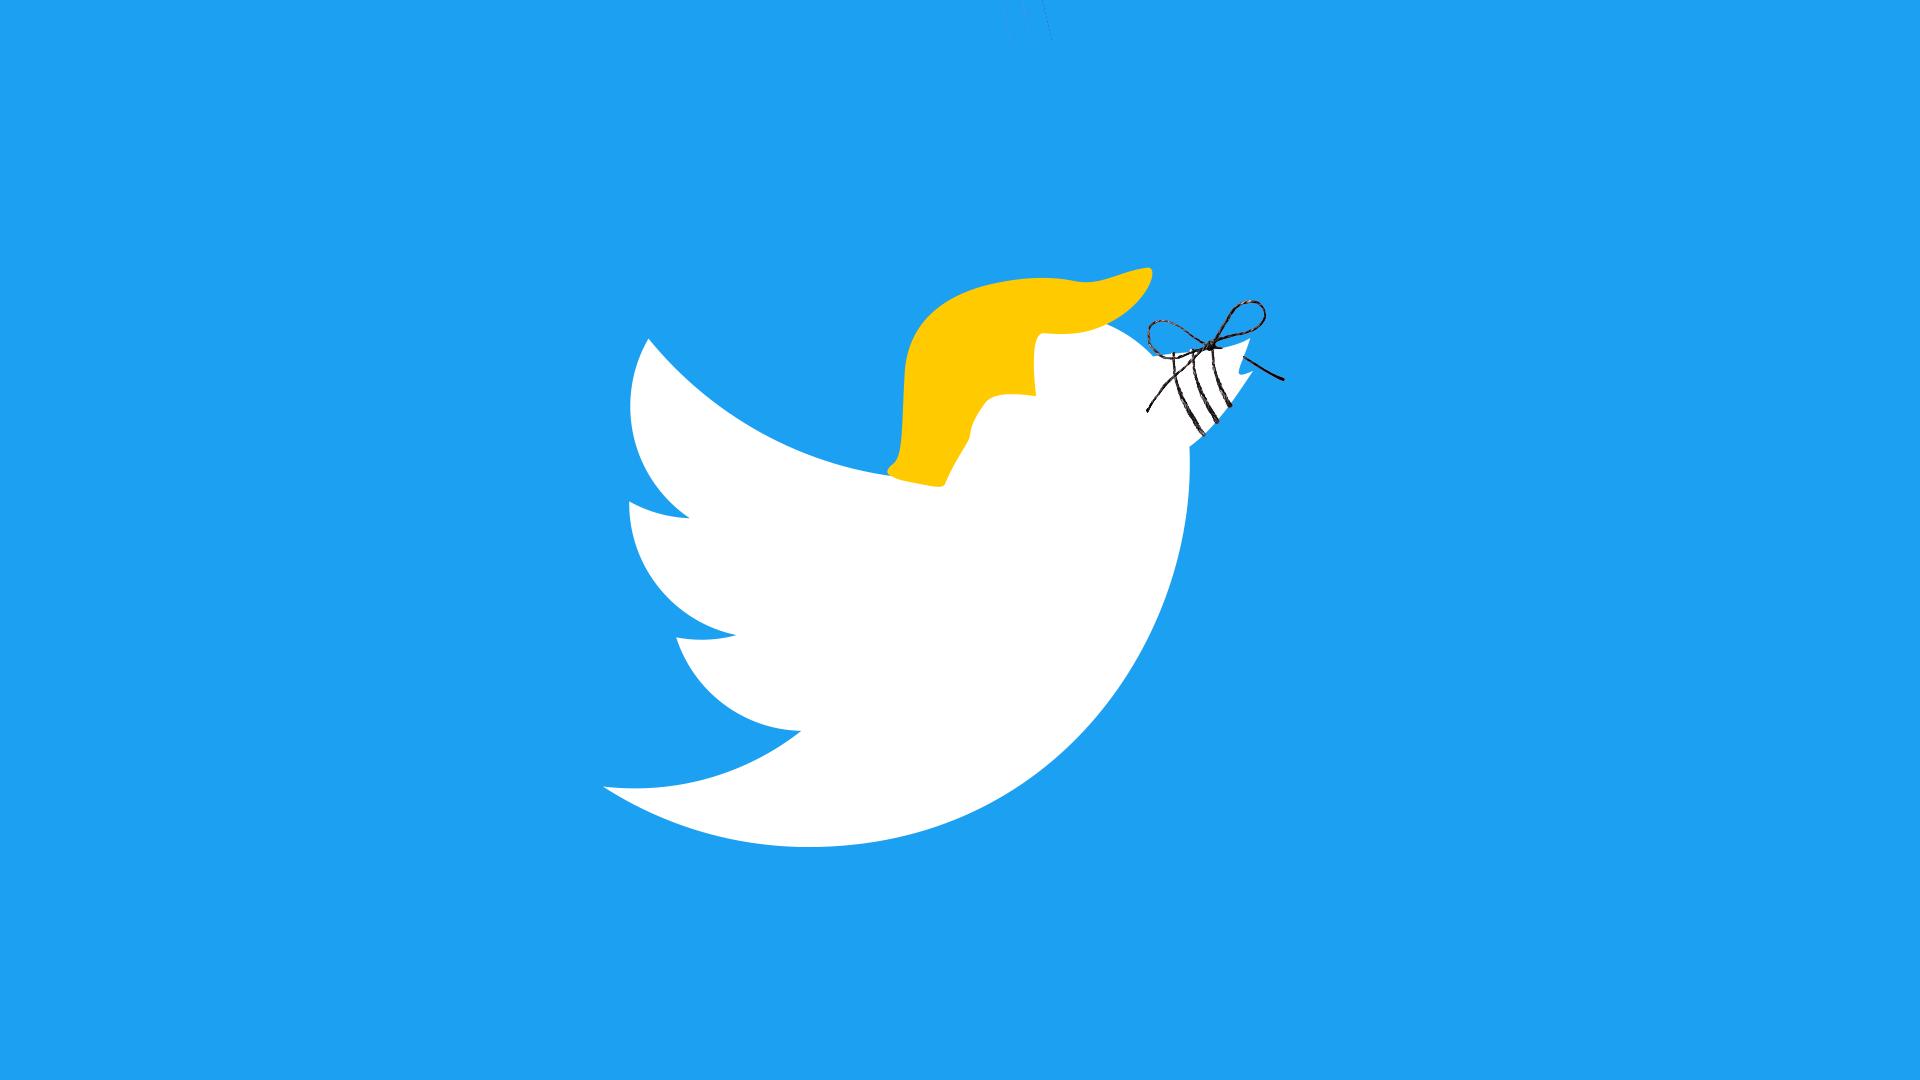 Metrics show Trump's tweets are losing their potency